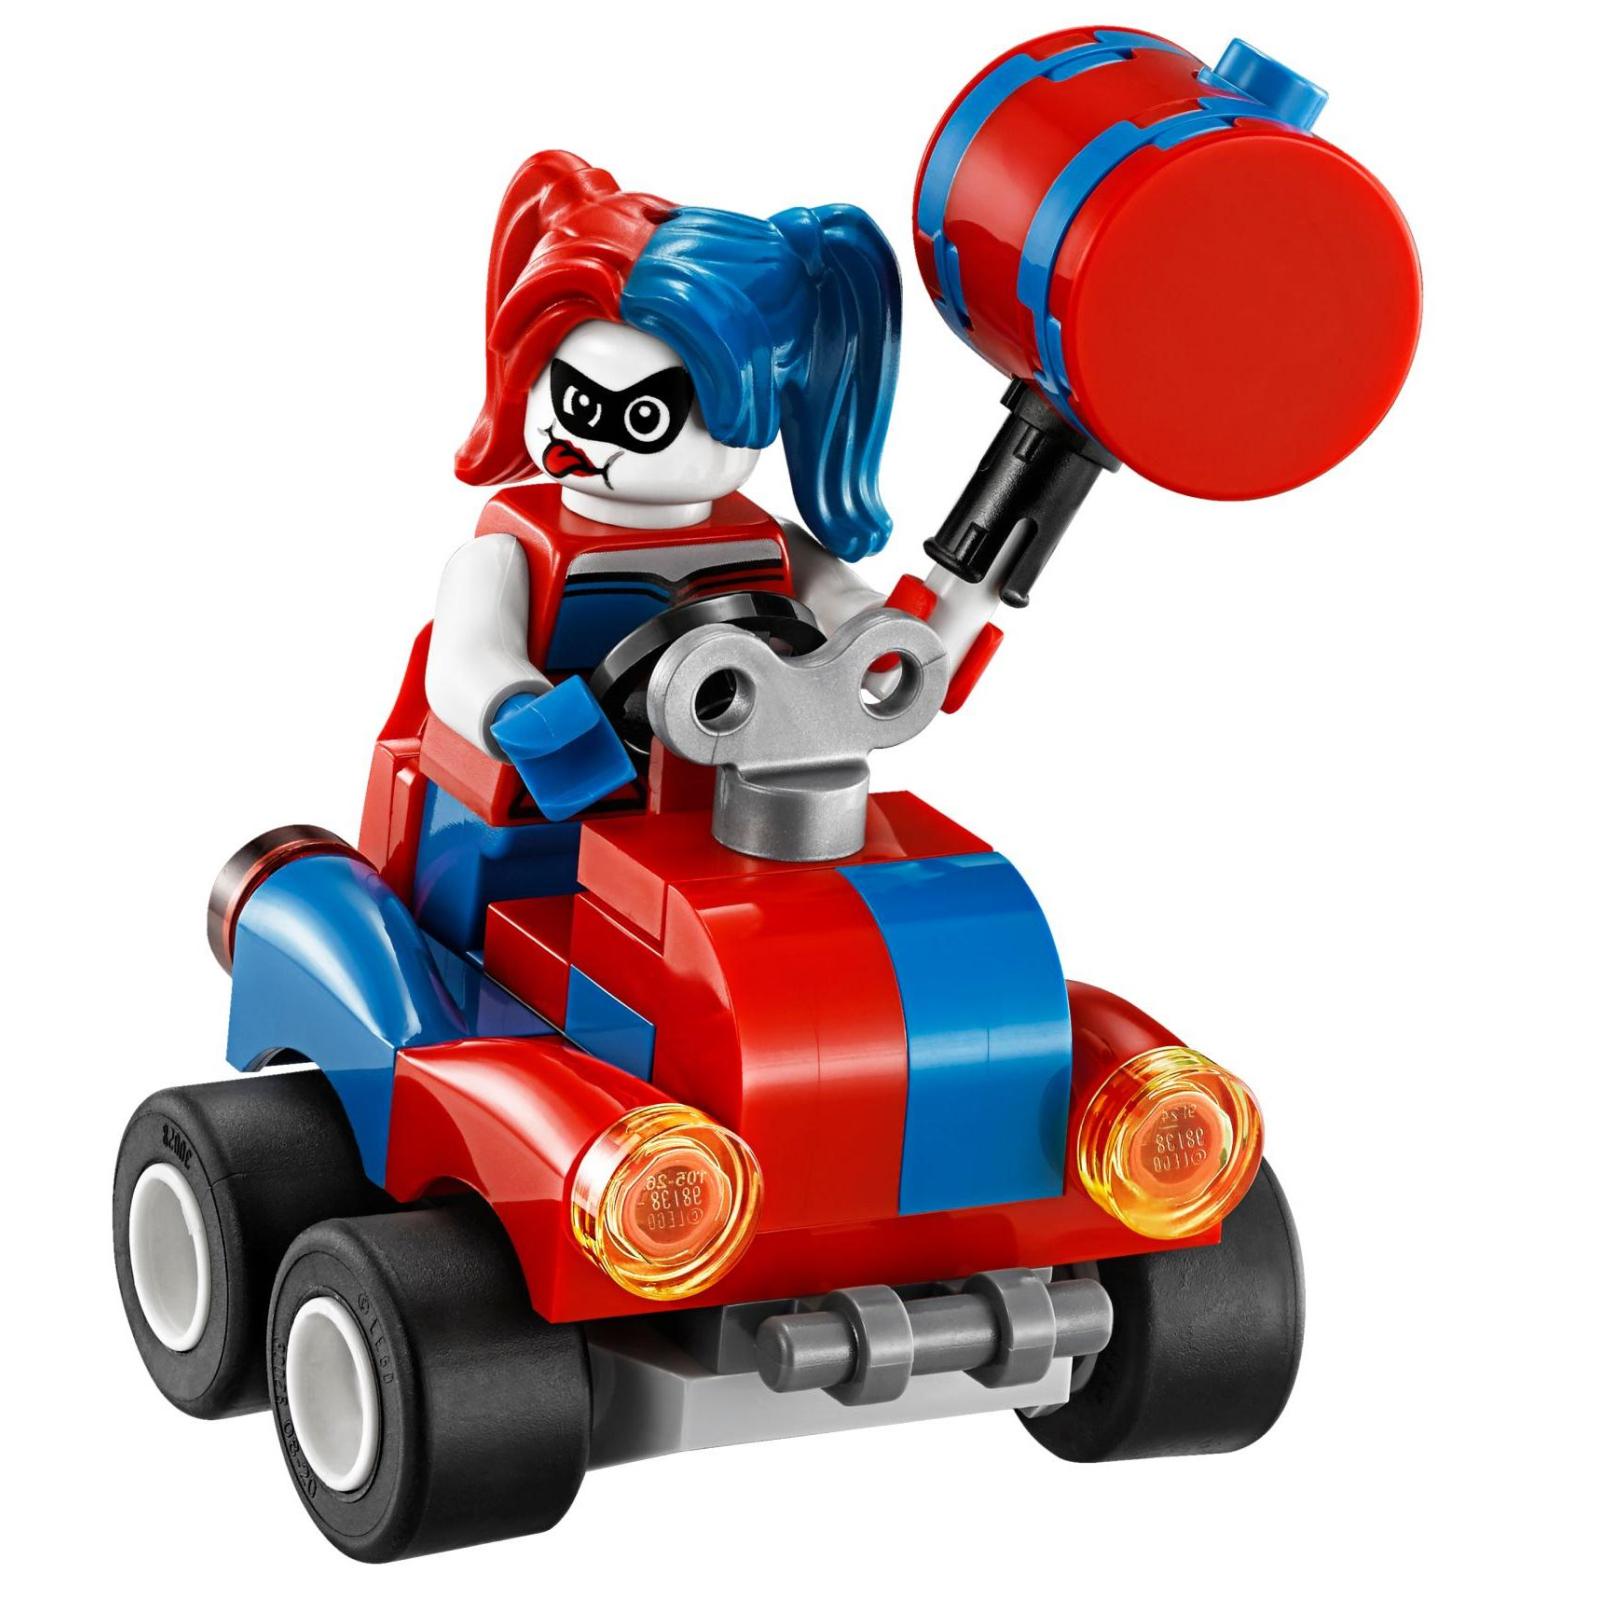 Конструктор LEGO Super Heroes Mighty Micros: Бэтмен против Харли Квин (76092) изображение 4